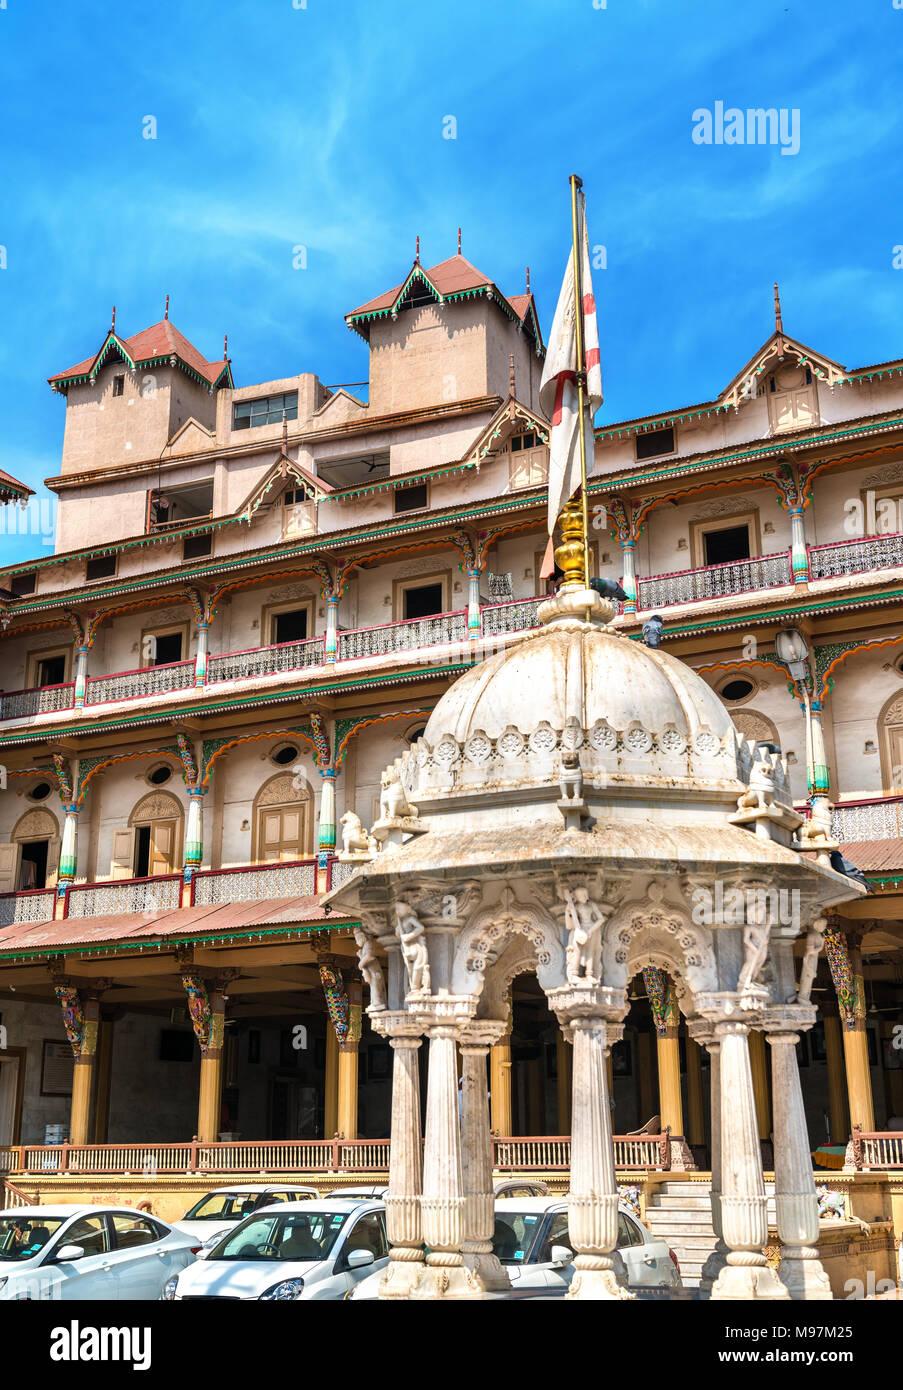 Kalupur Swaminarayan Mandir, a hindu temple in the old city of Ahmedabad - Gujarat State of India - Stock Image